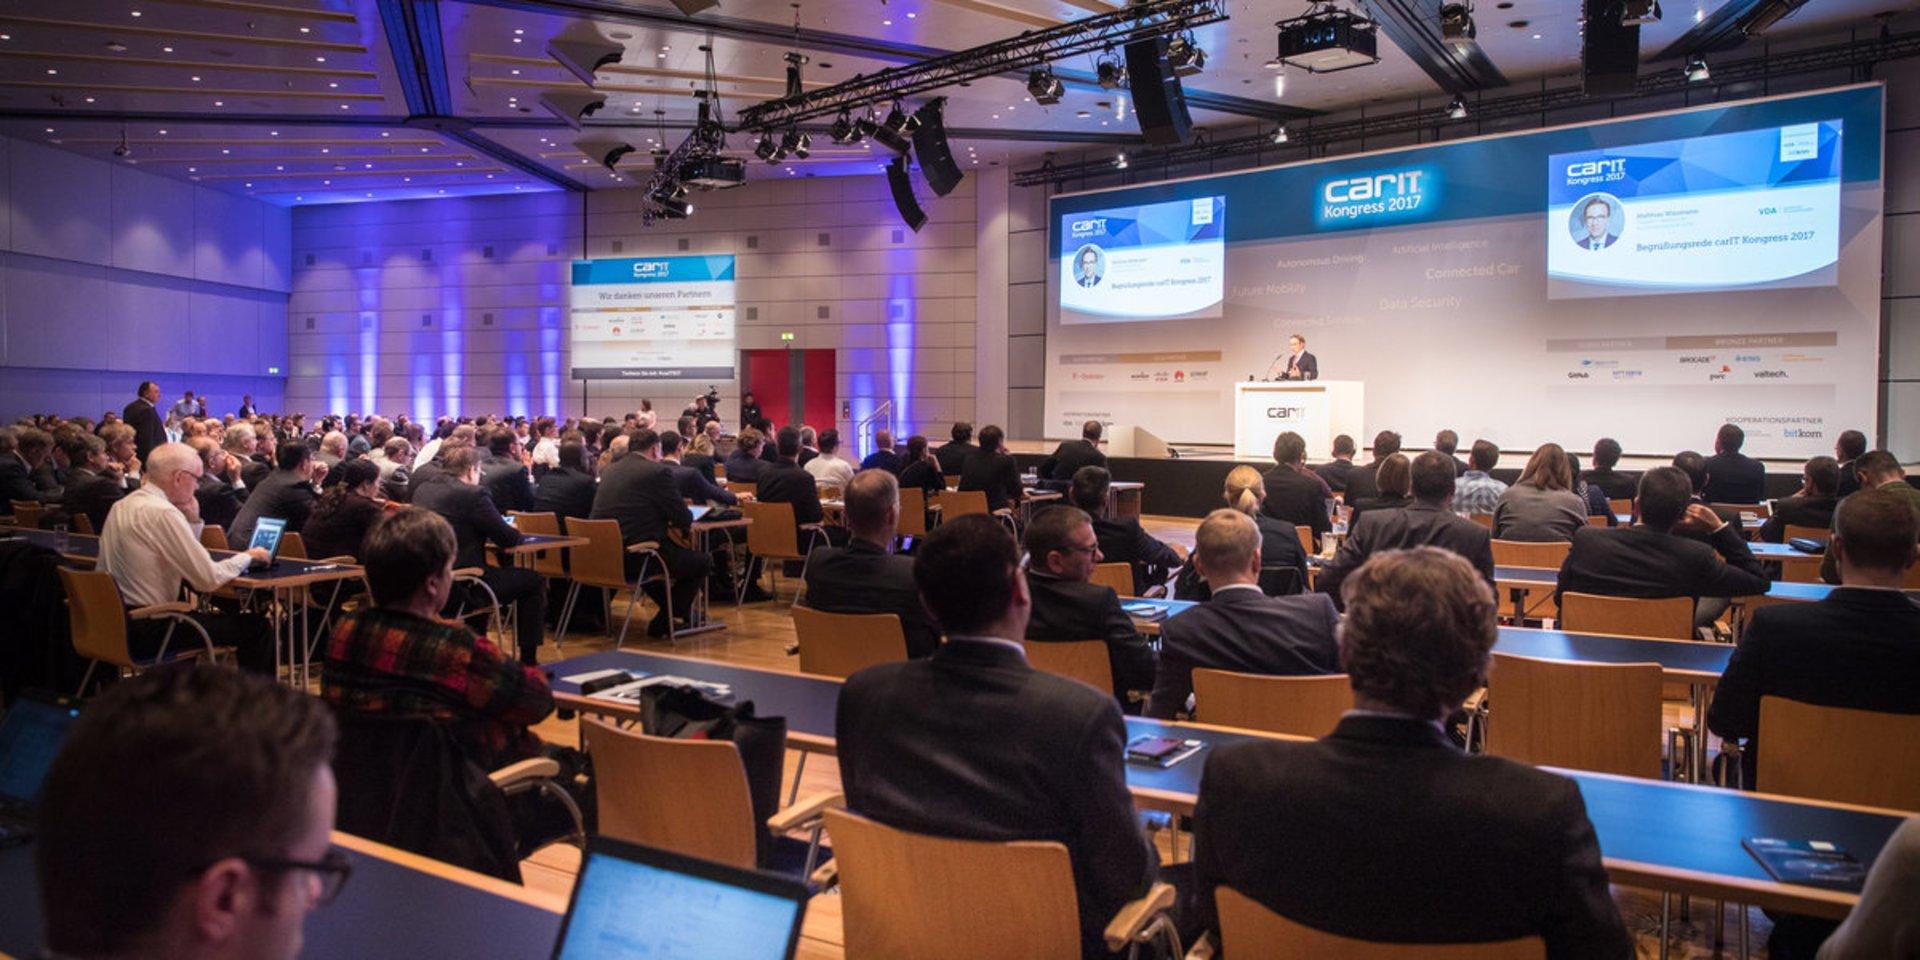 Best time to see Frankfurt Auto Motor Show (IAA) 2020